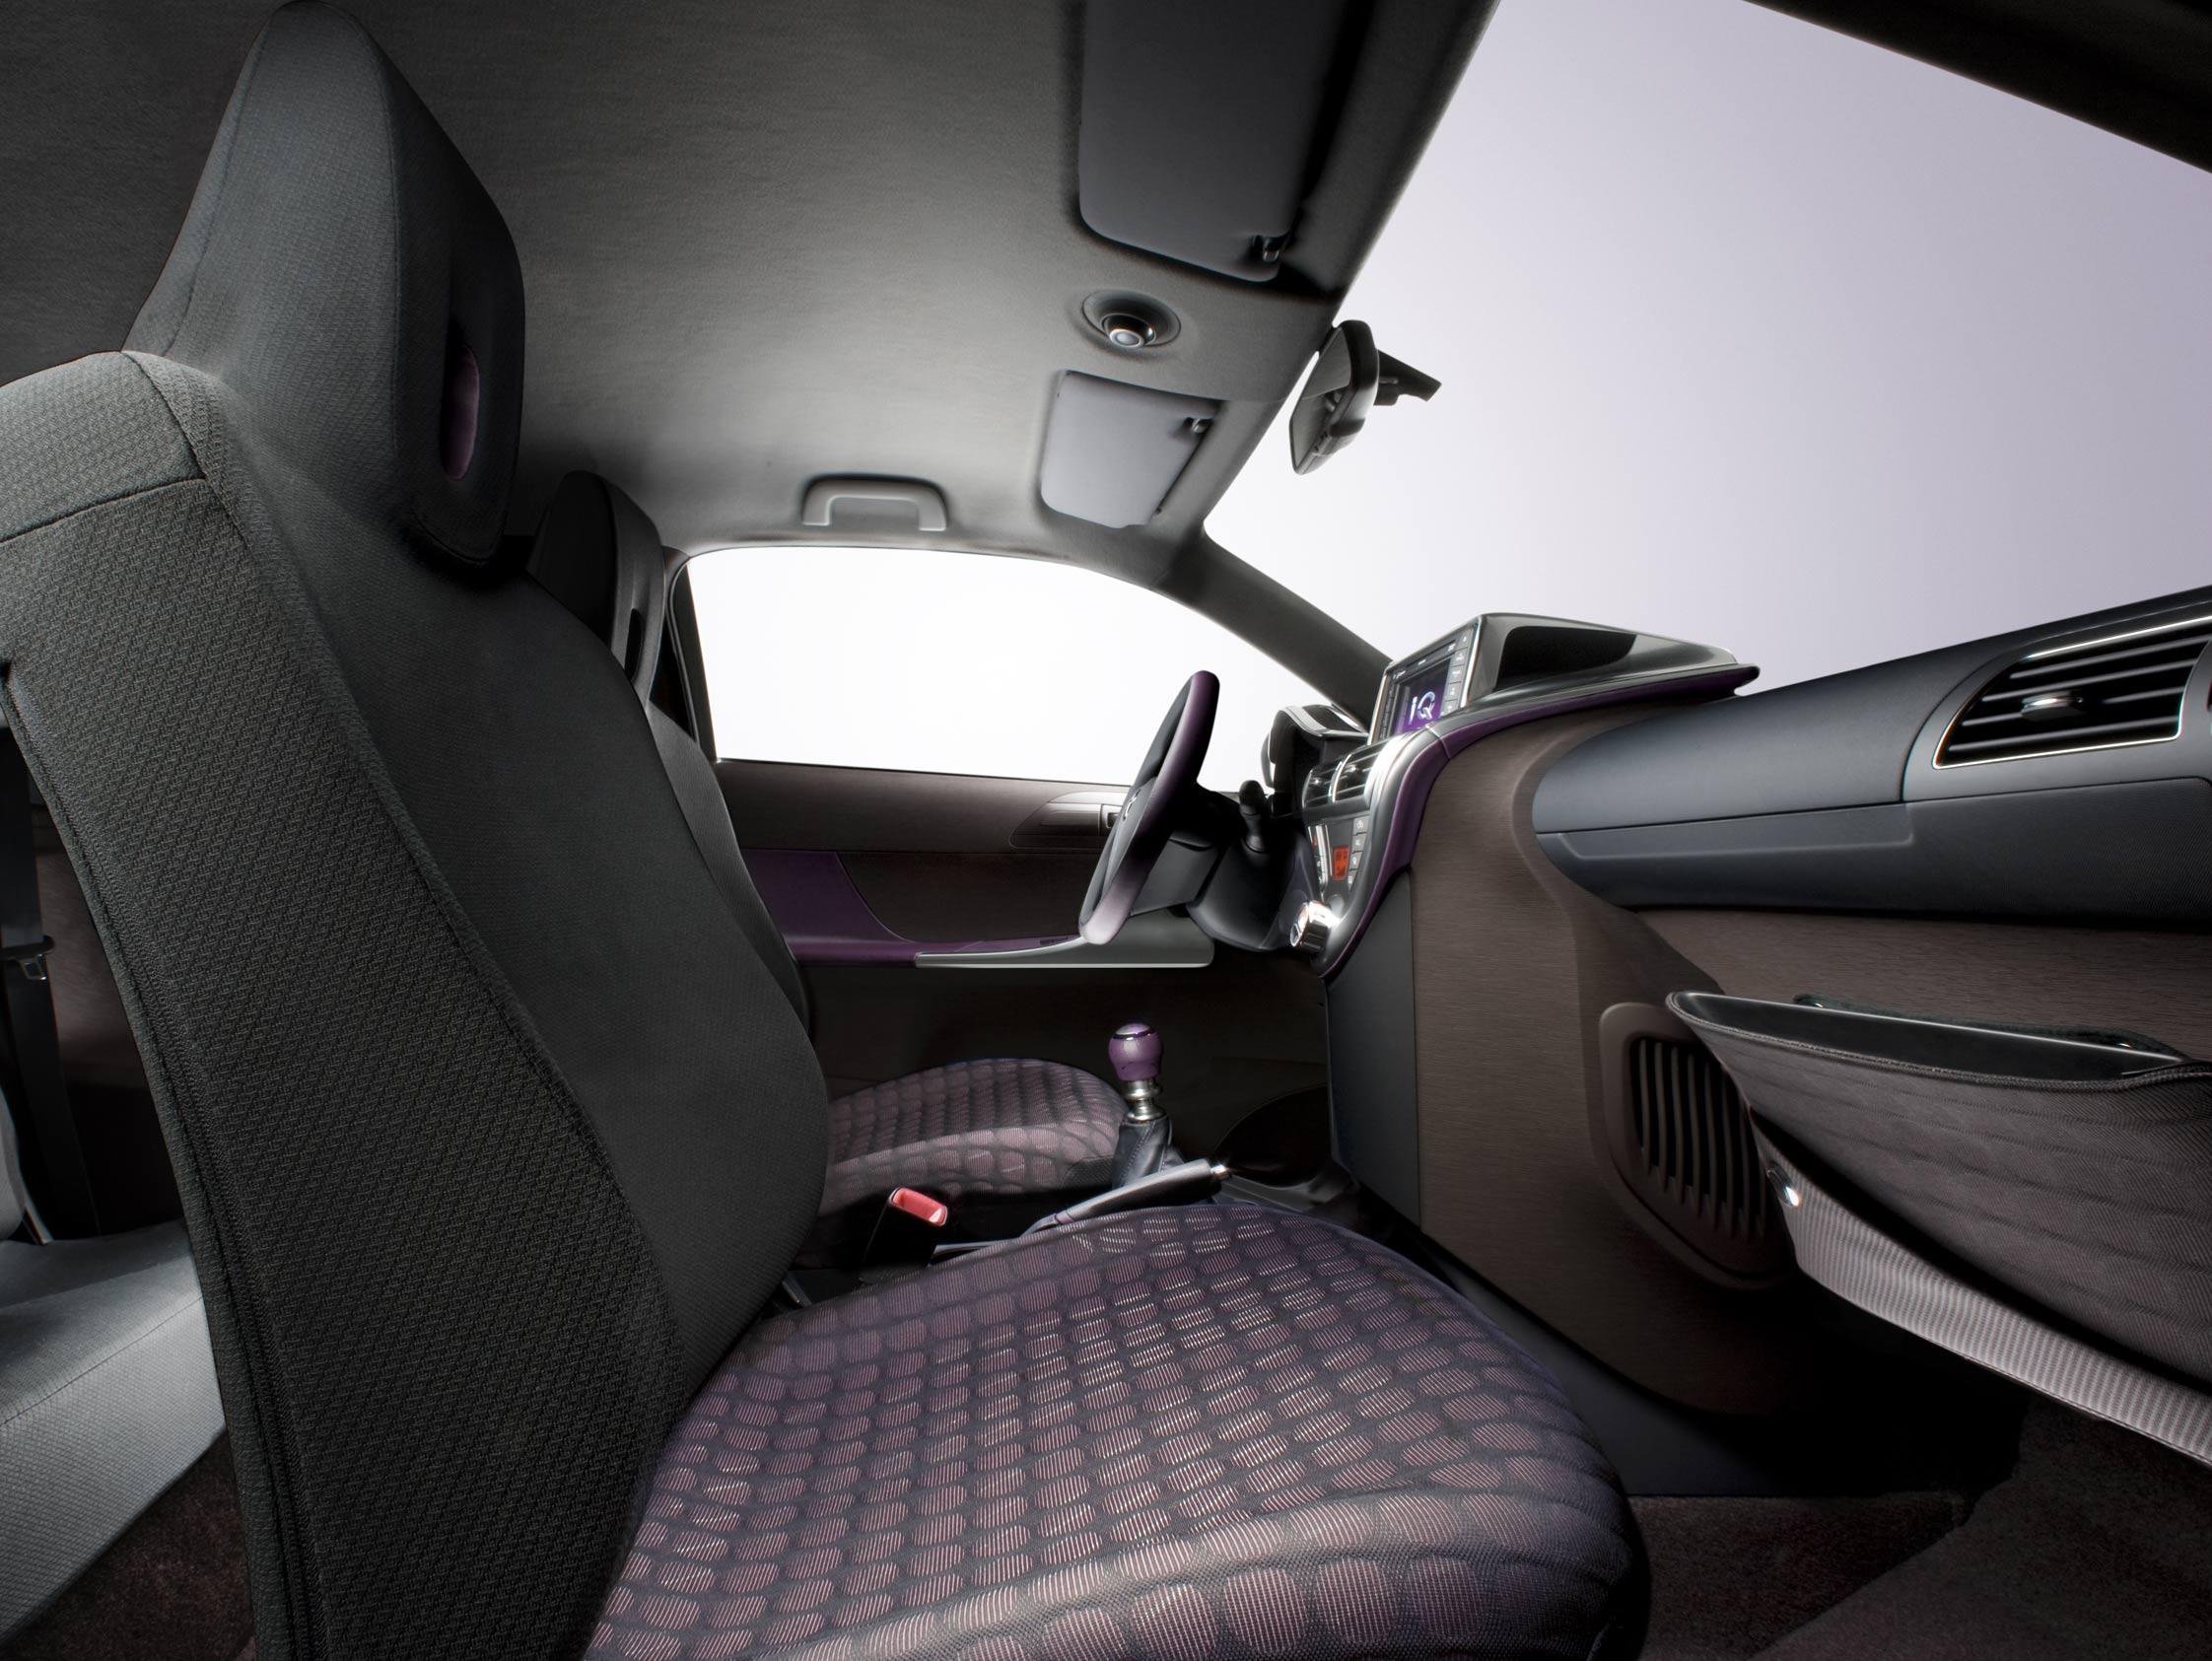 toyota iq mondial automobile 2008. Black Bedroom Furniture Sets. Home Design Ideas